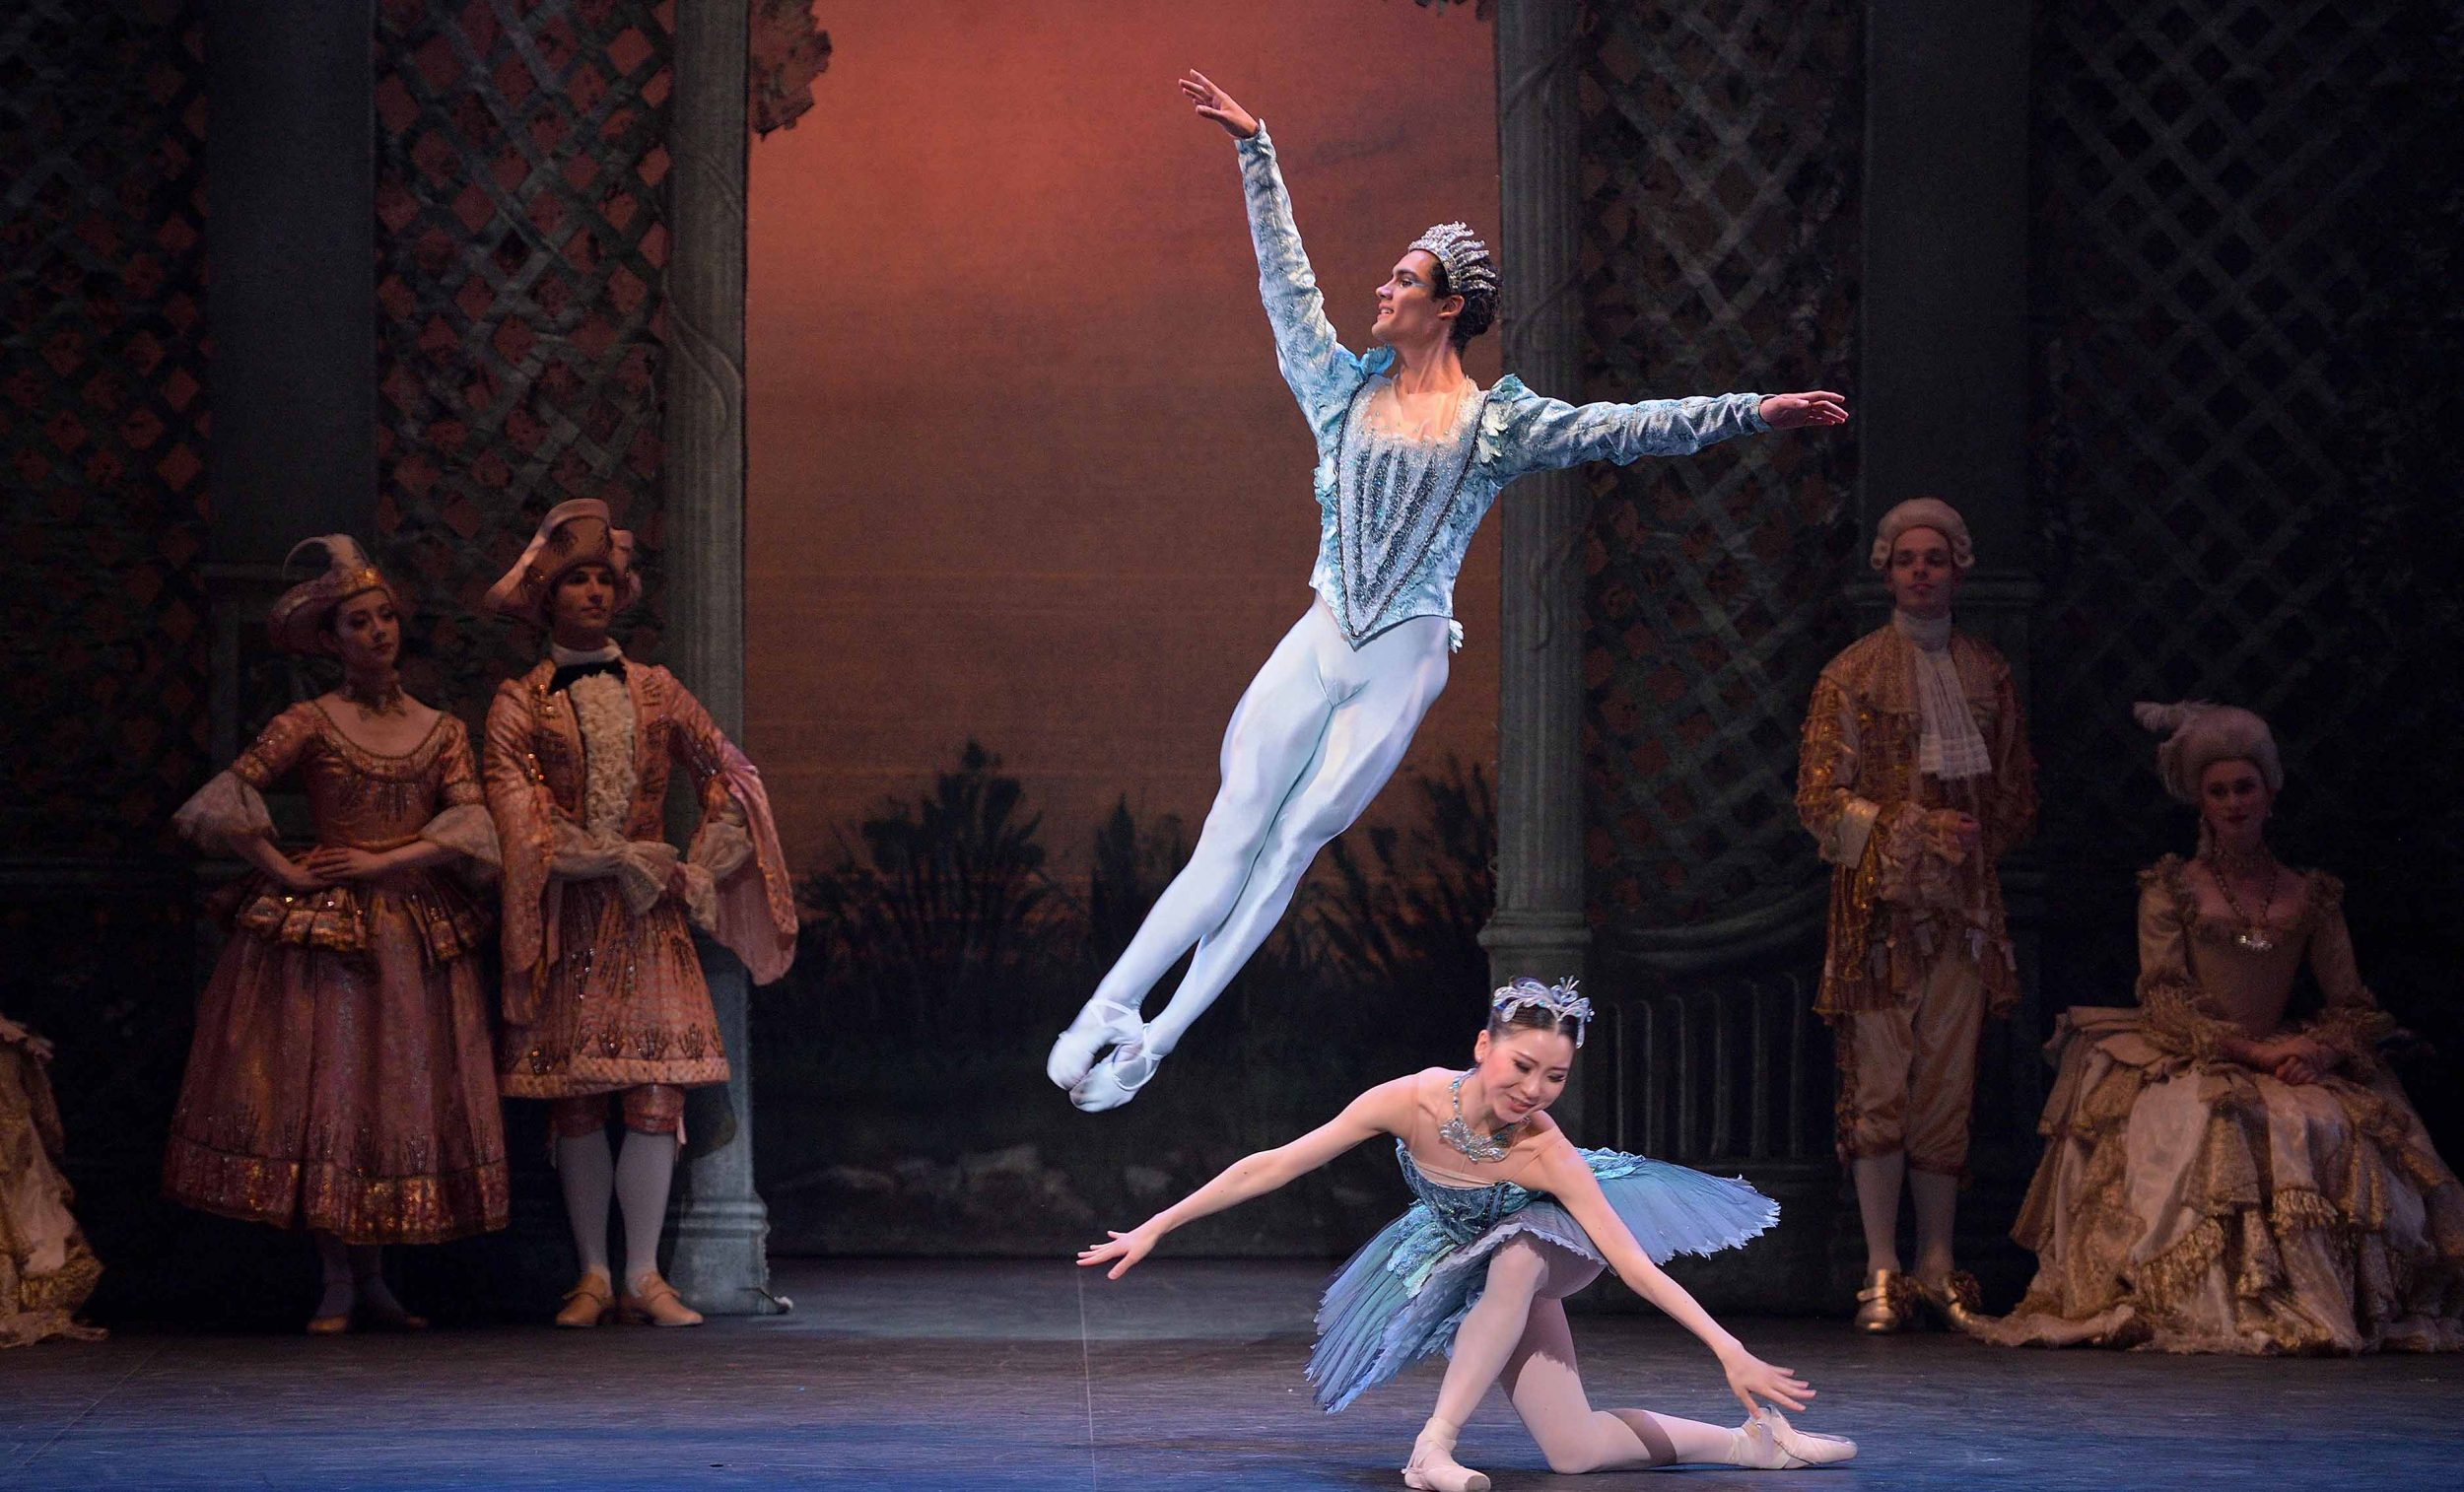 Daniel-McCormick-as-The-Bluebird-and-Rina-Kanehara-as-Princess-Florine-in-The-Sleeping-Beauty-©-Laurent-Liotardo-(2)_WEB